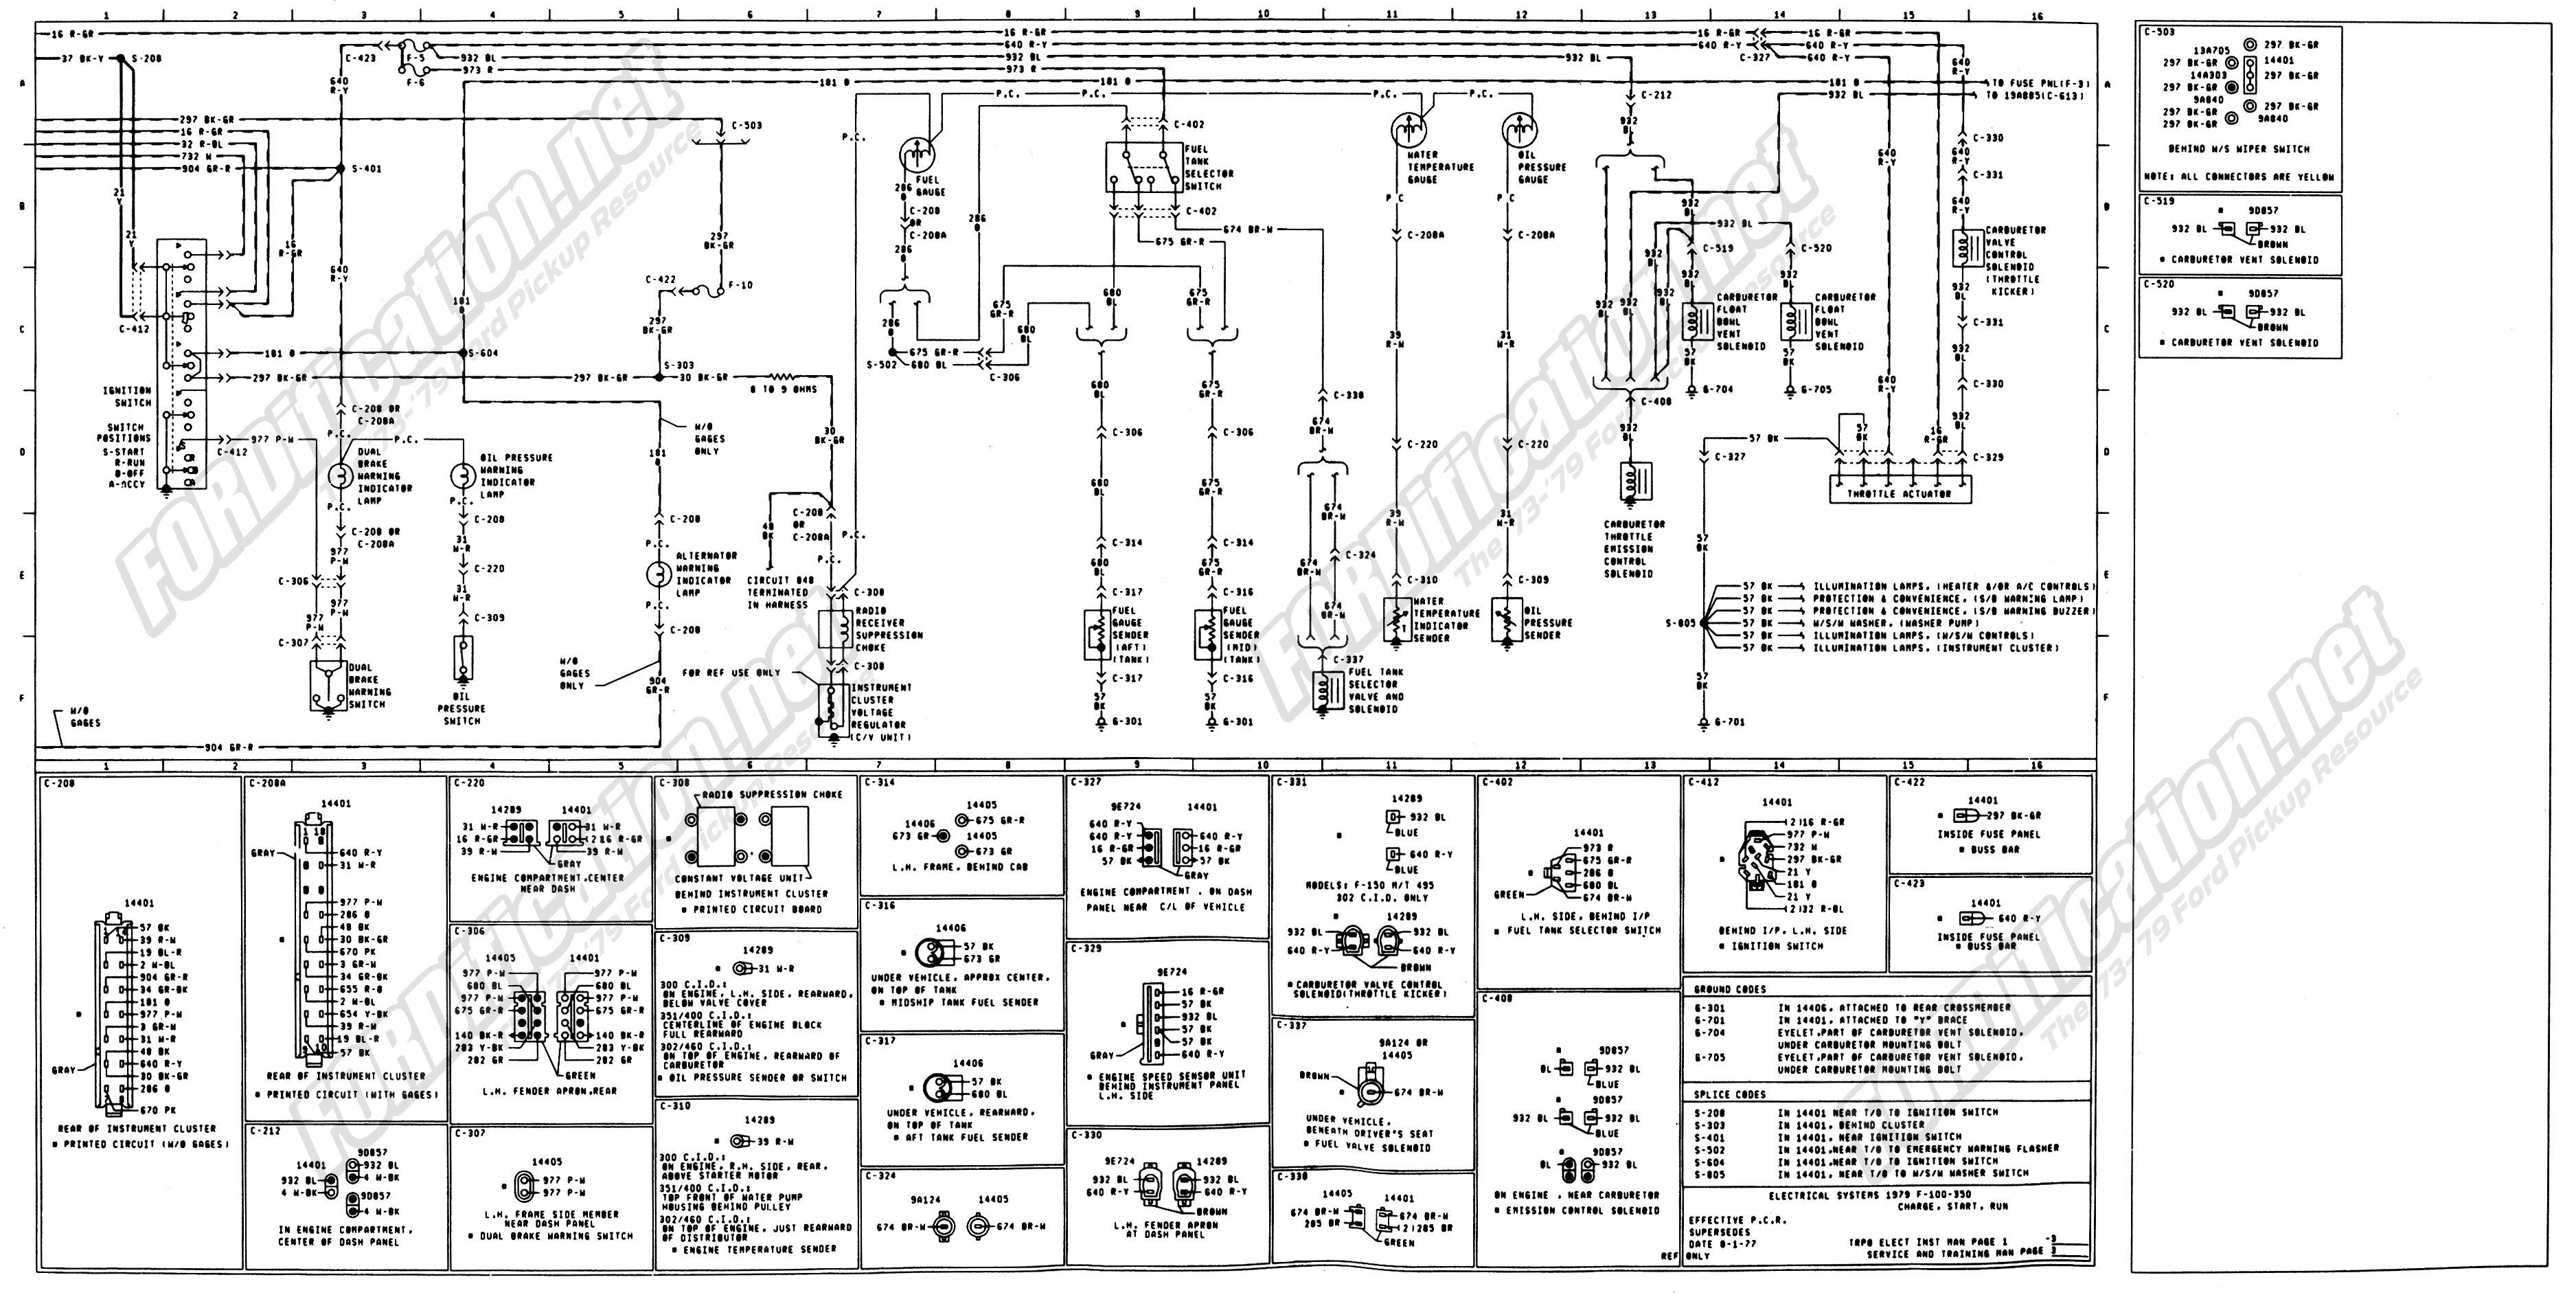 6 0 Powerstroke Injector Wiring Harness - Wiring Diagram Detailed - 6.0 Powerstroke Wiring Harness Diagram